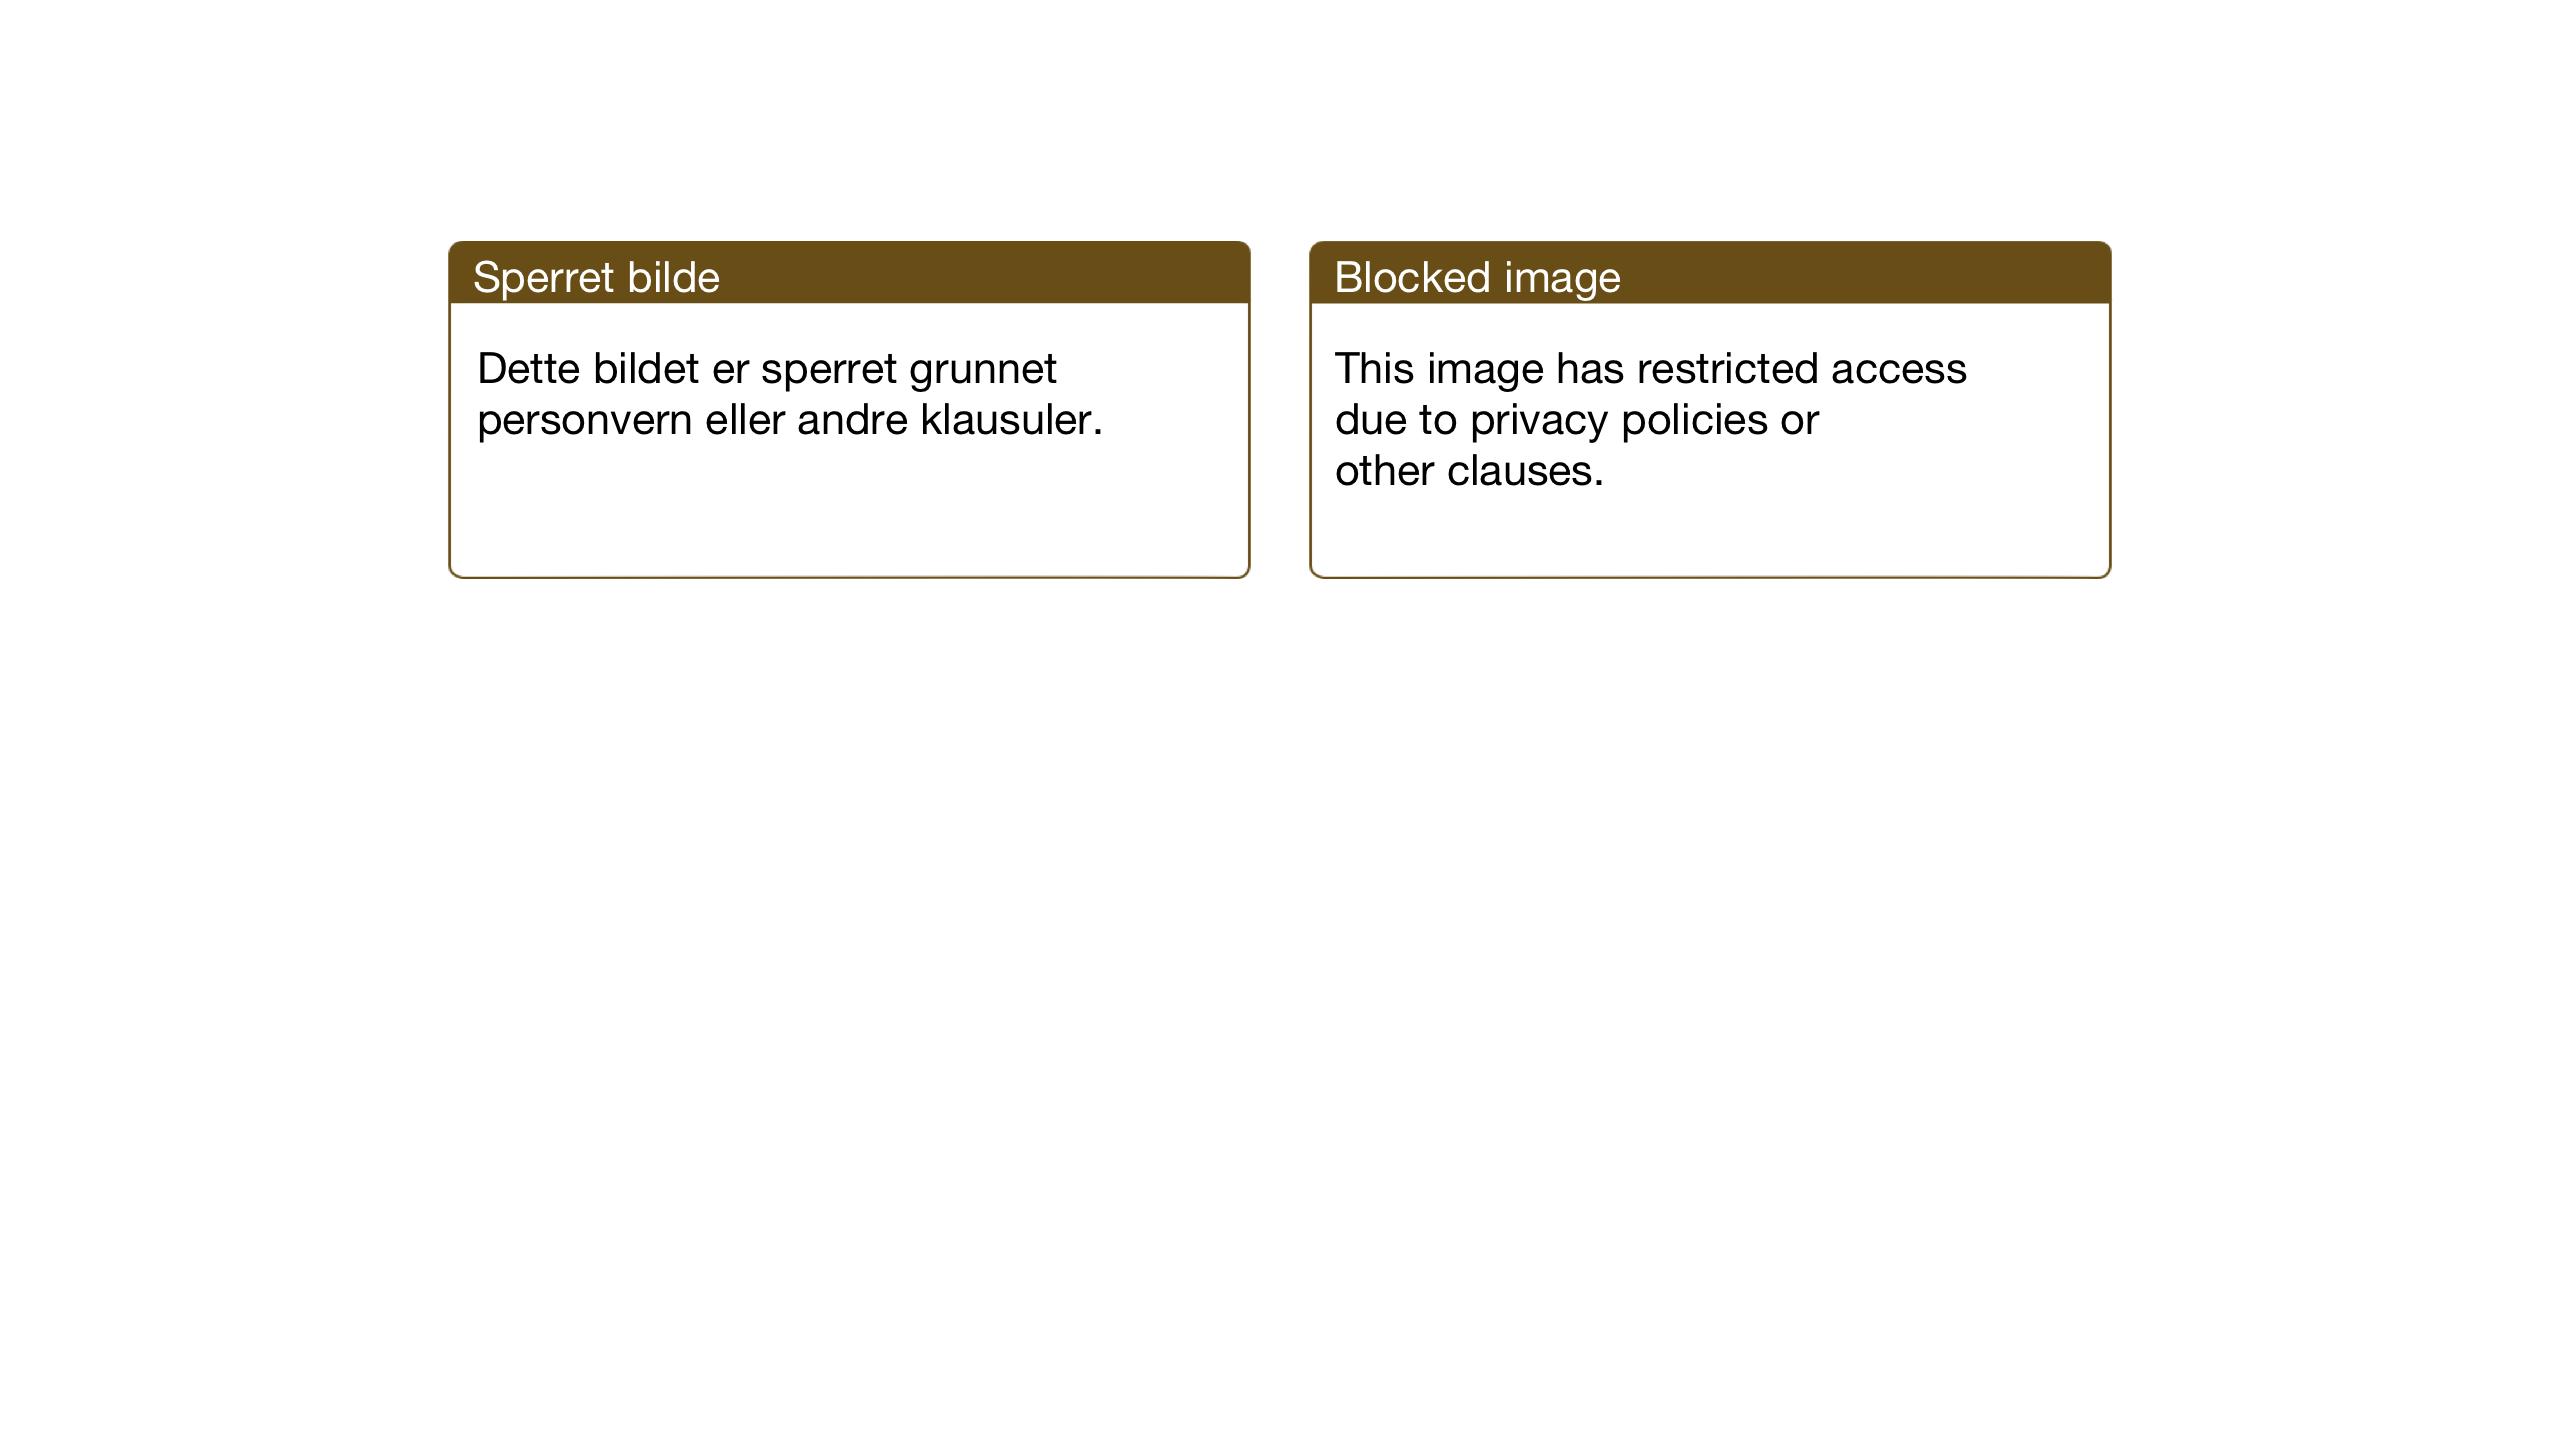 SAH, Vardal prestekontor, H/Ha/Haa/L0018: Ministerialbok nr. 18, 1930-1945, s. 138